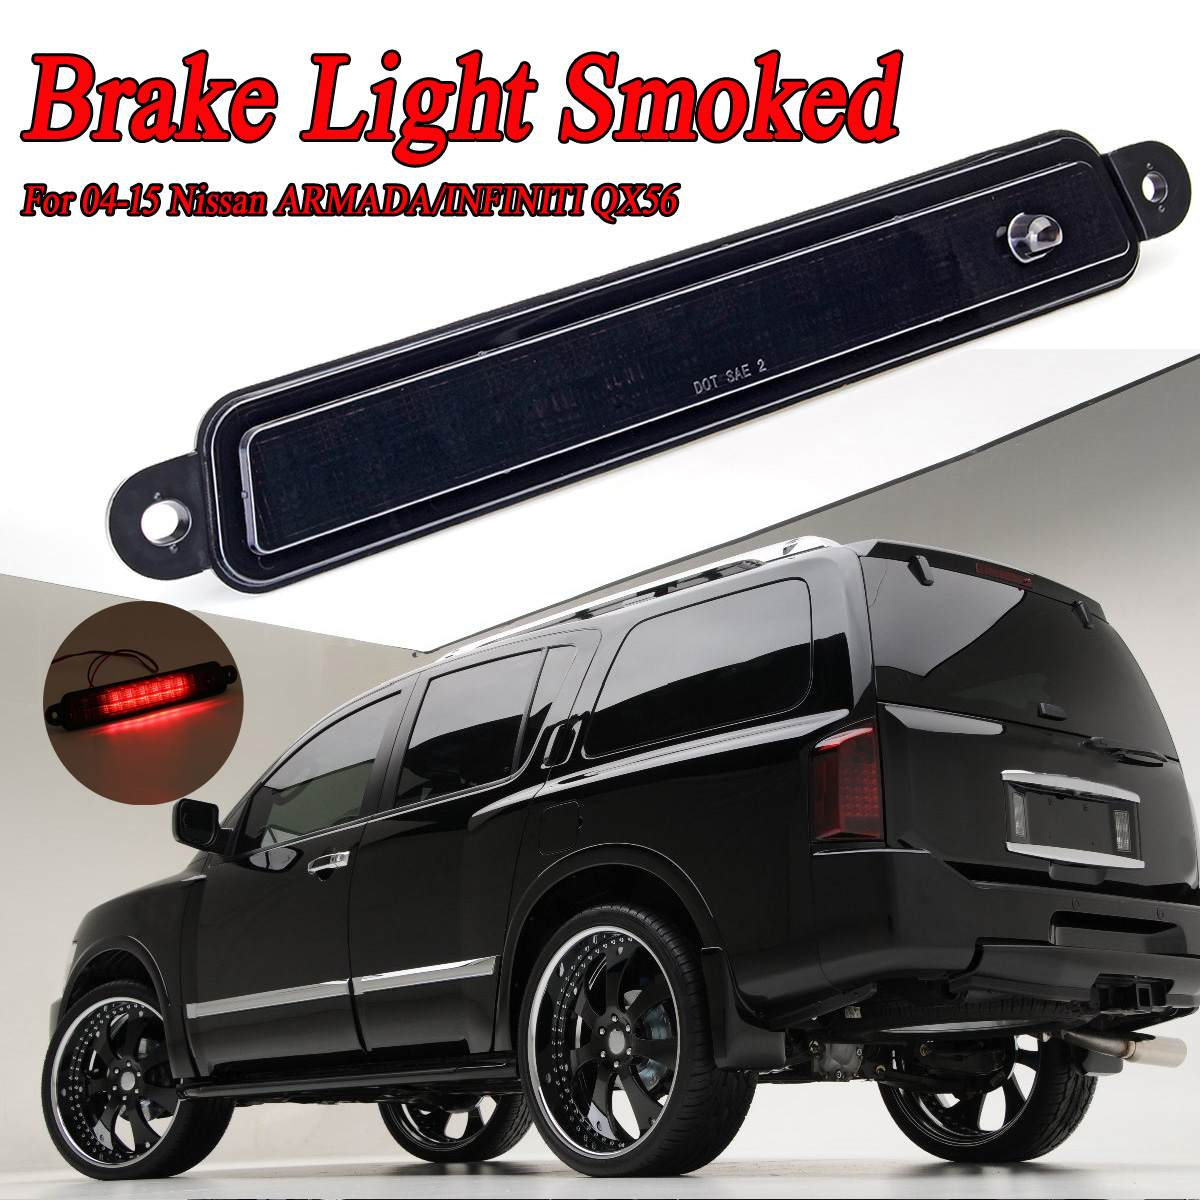 High Mount Led 3Rd Brake Light For Nissan For Armada 2005-2015 Pathfinder For Armada 2004 For Infiniti QX56 2004-2010 Smoke